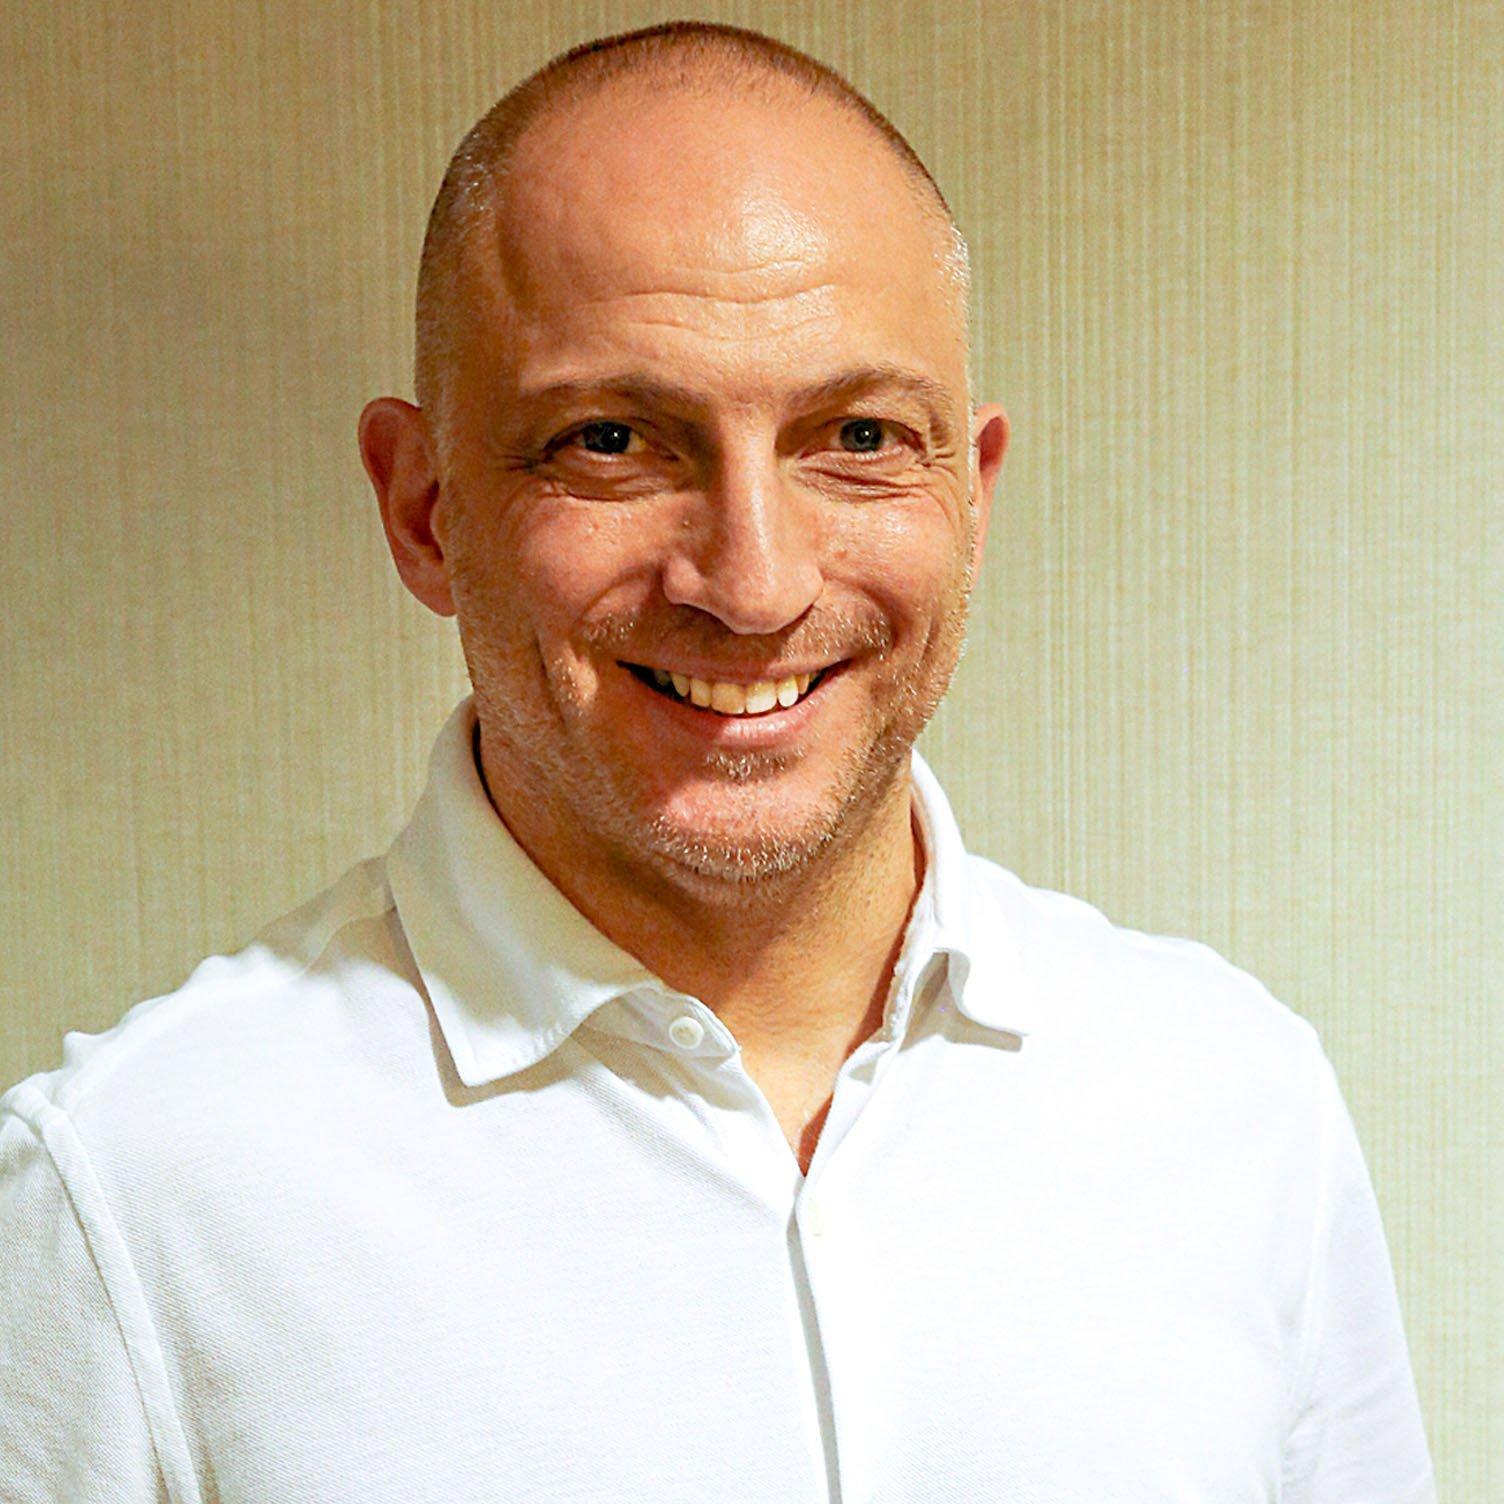 Neil Feingold: Vice President, SAP Solutions, Europe